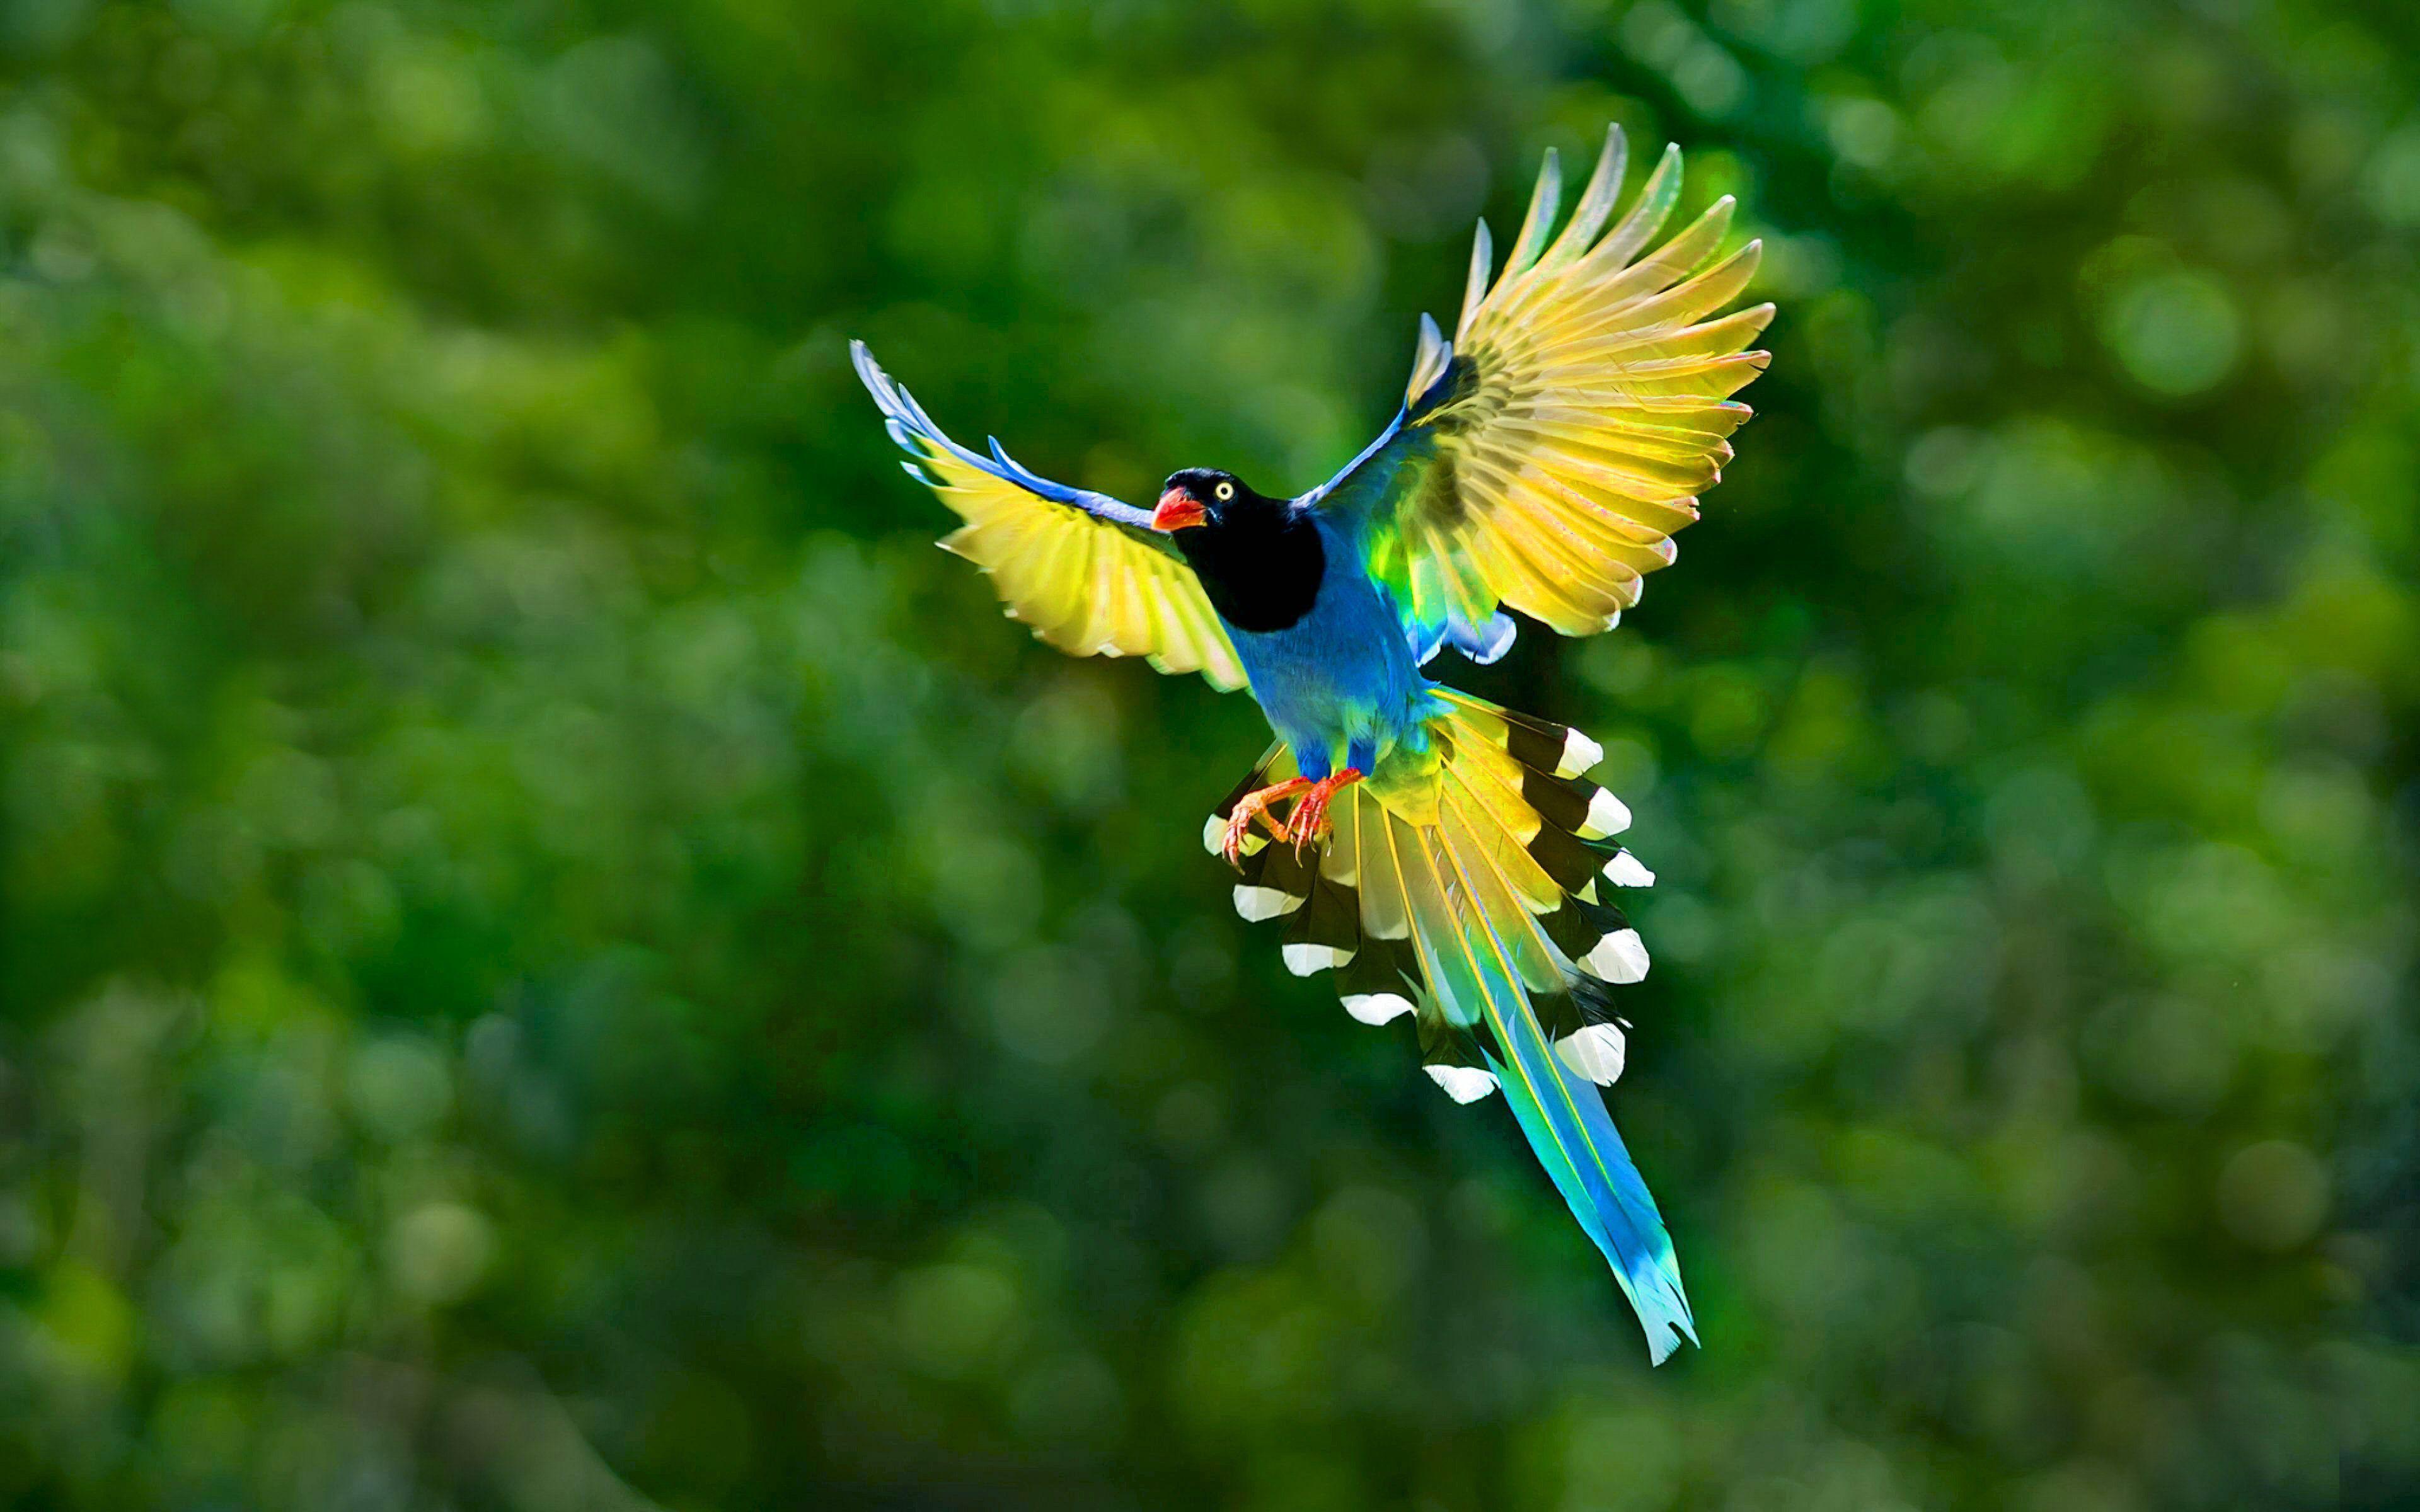 Flying Birds Beautiful Hd Wallpapers 3840 2400 Via Classy Bro Pet Birds Beautiful Birds Bird Wallpaper